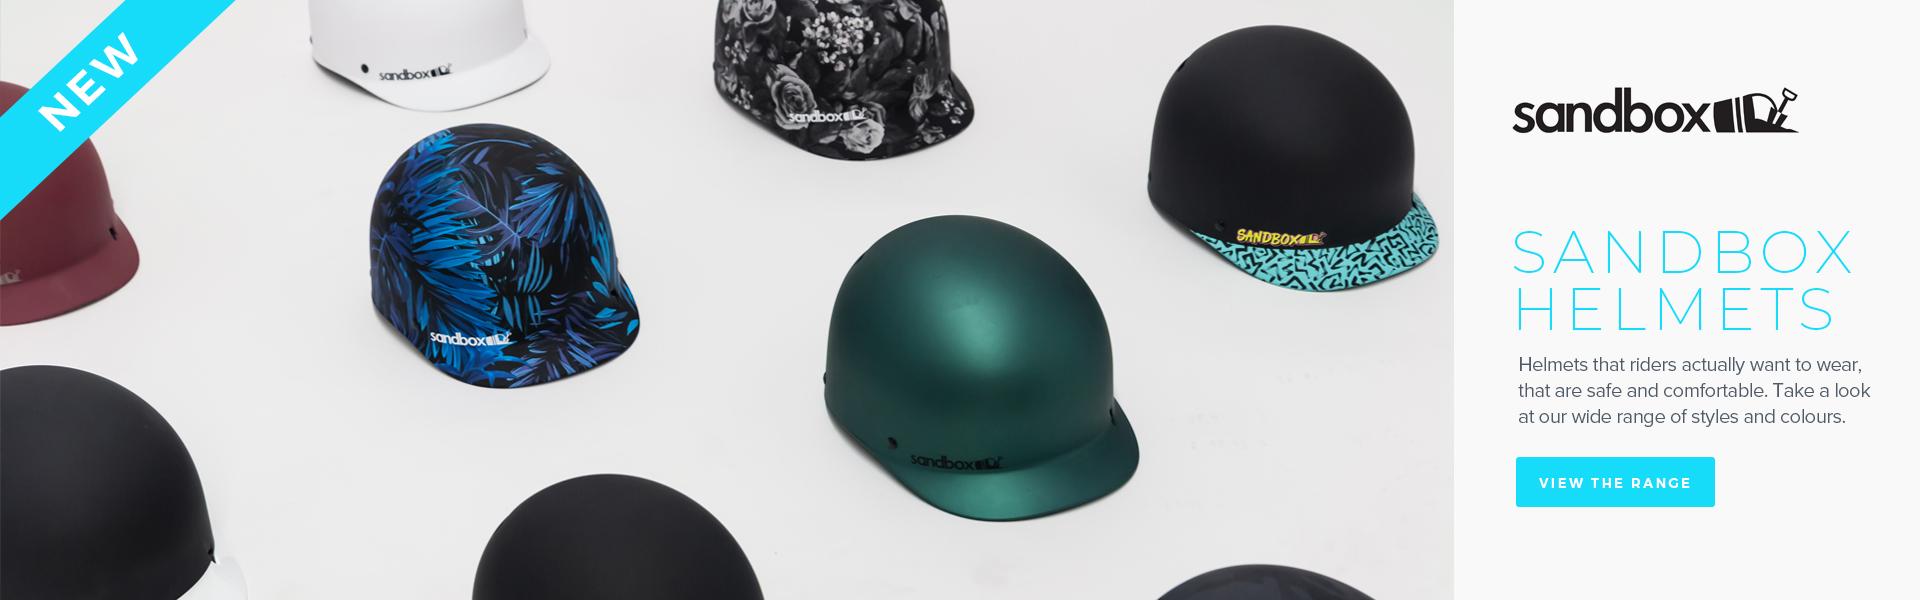 Sandbox Helmets